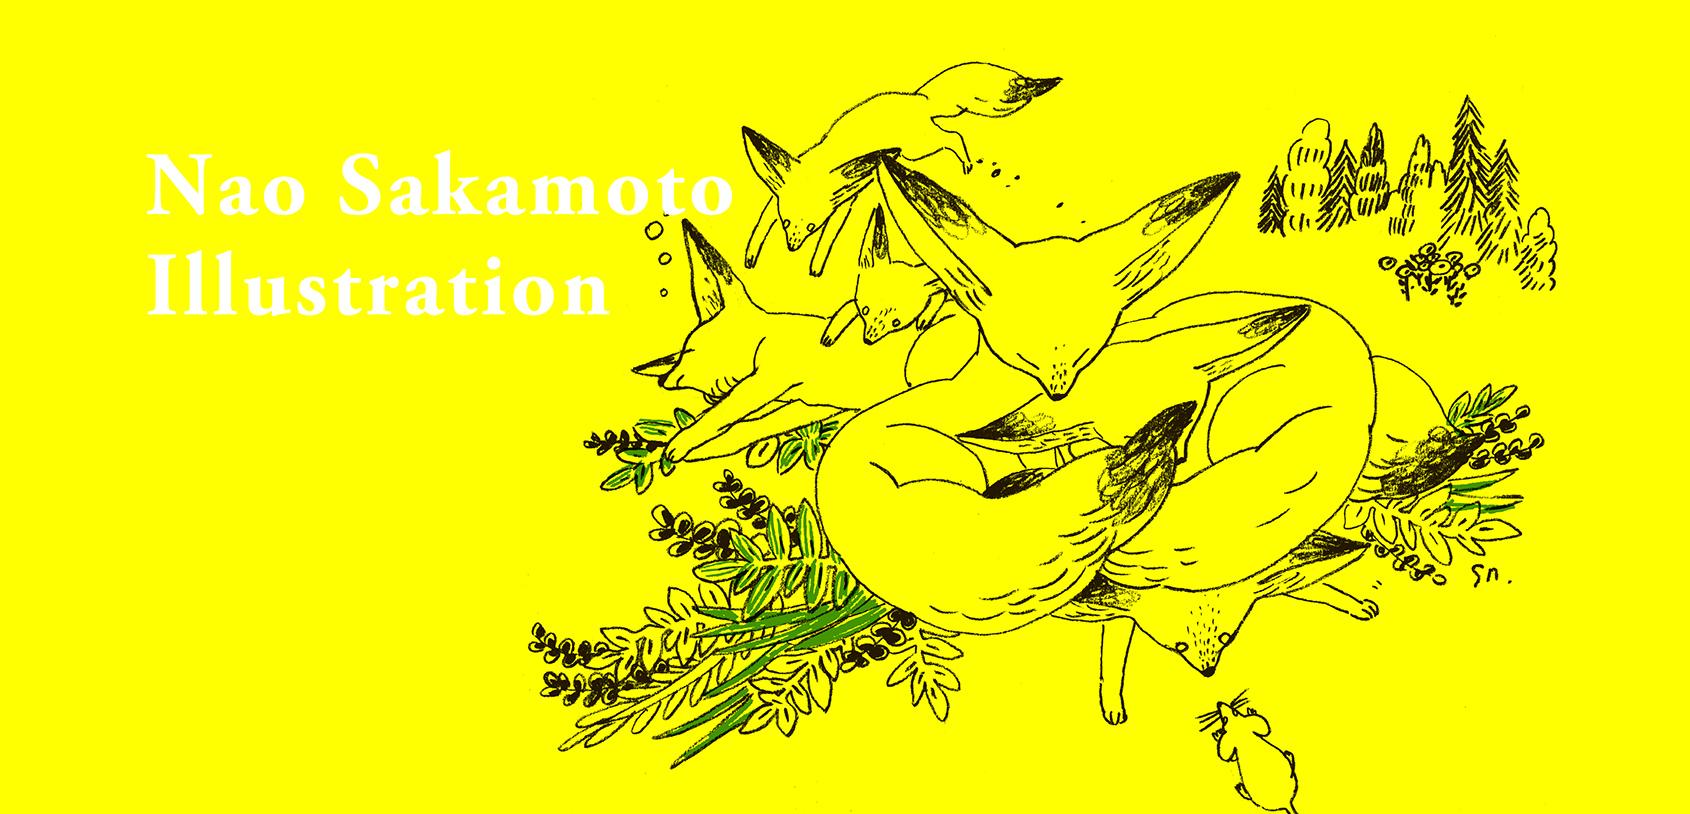 sakamoto nao shop